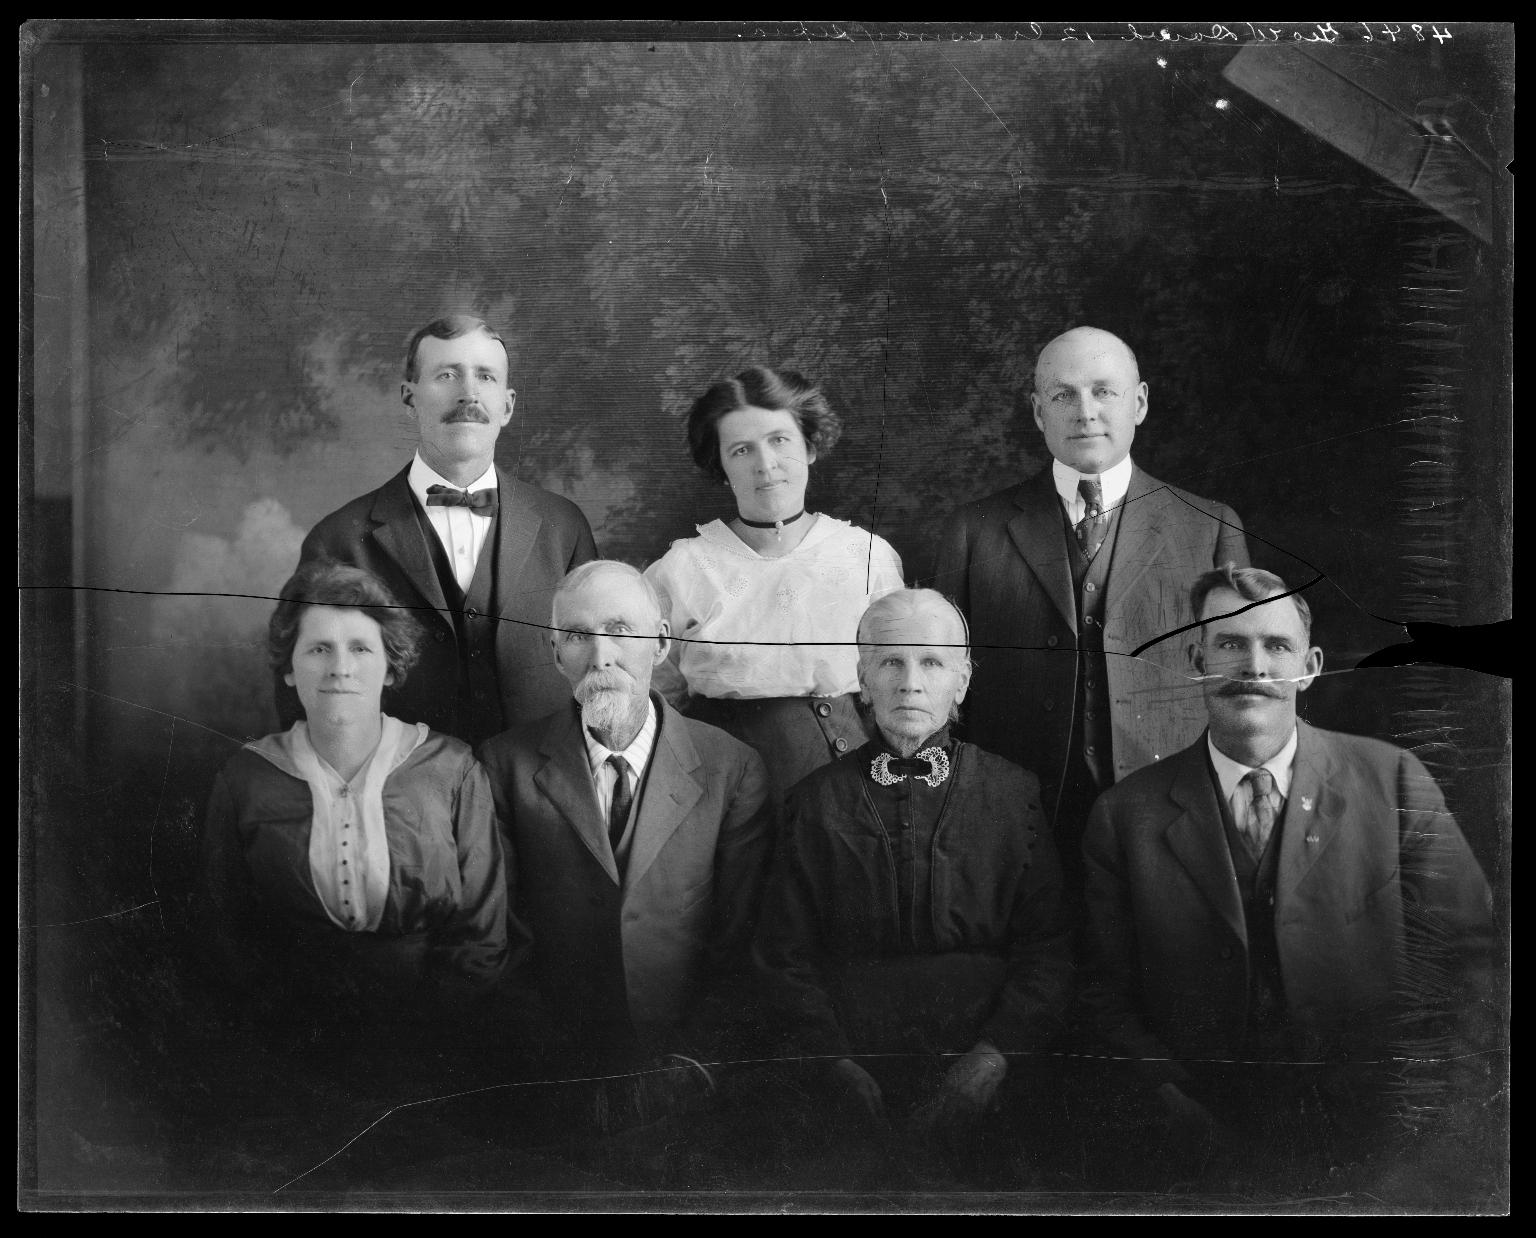 Portrait of unidentified men and women